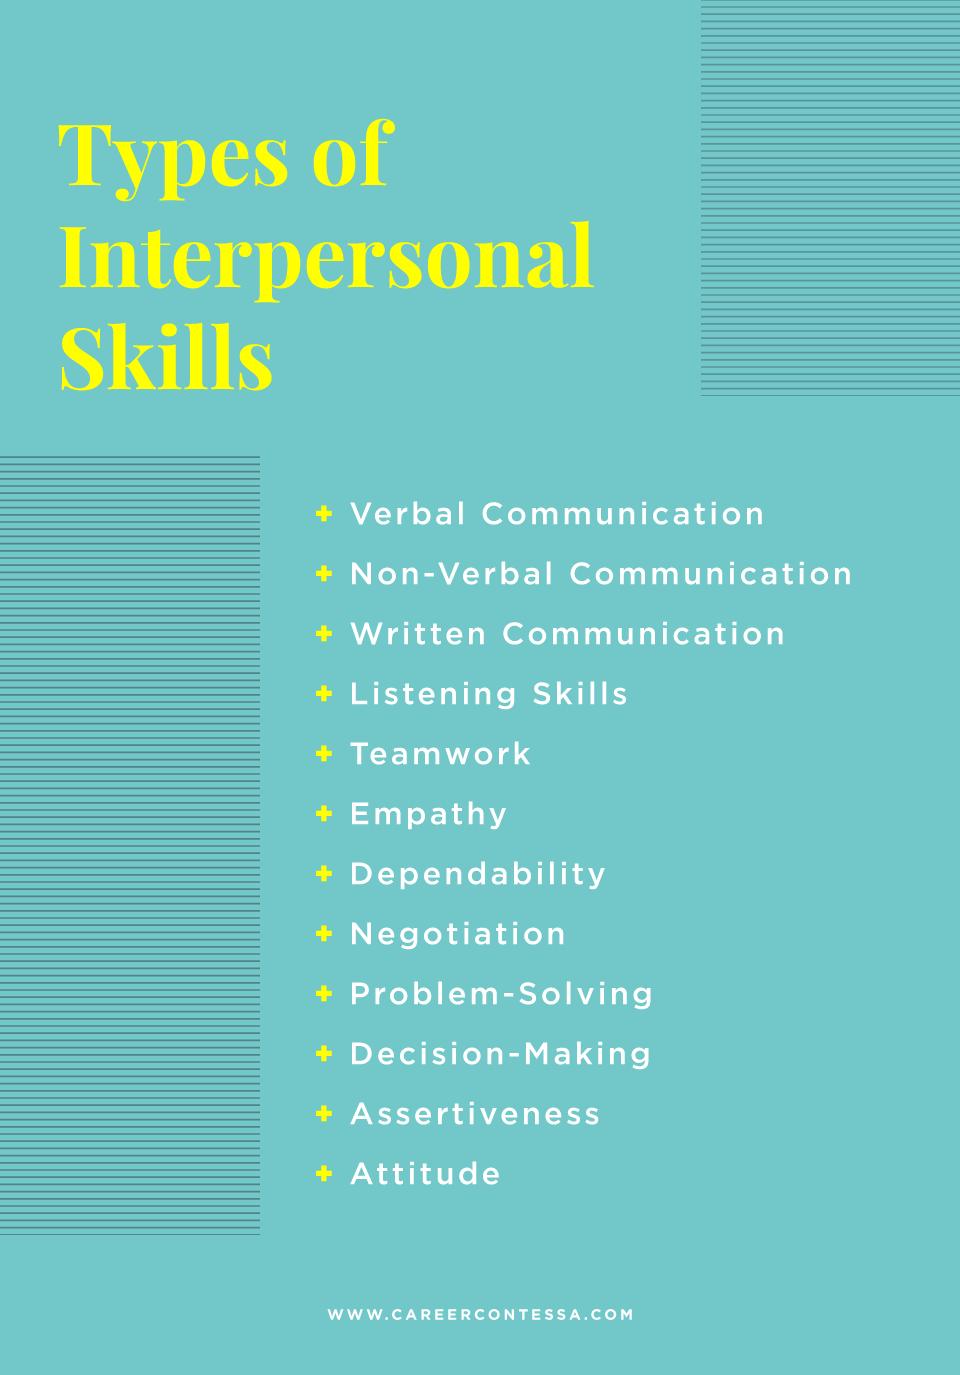 Pin By Robert Peston On Communications Plan Interpersonal Skills Interpersonal Skills Activities Work Skills